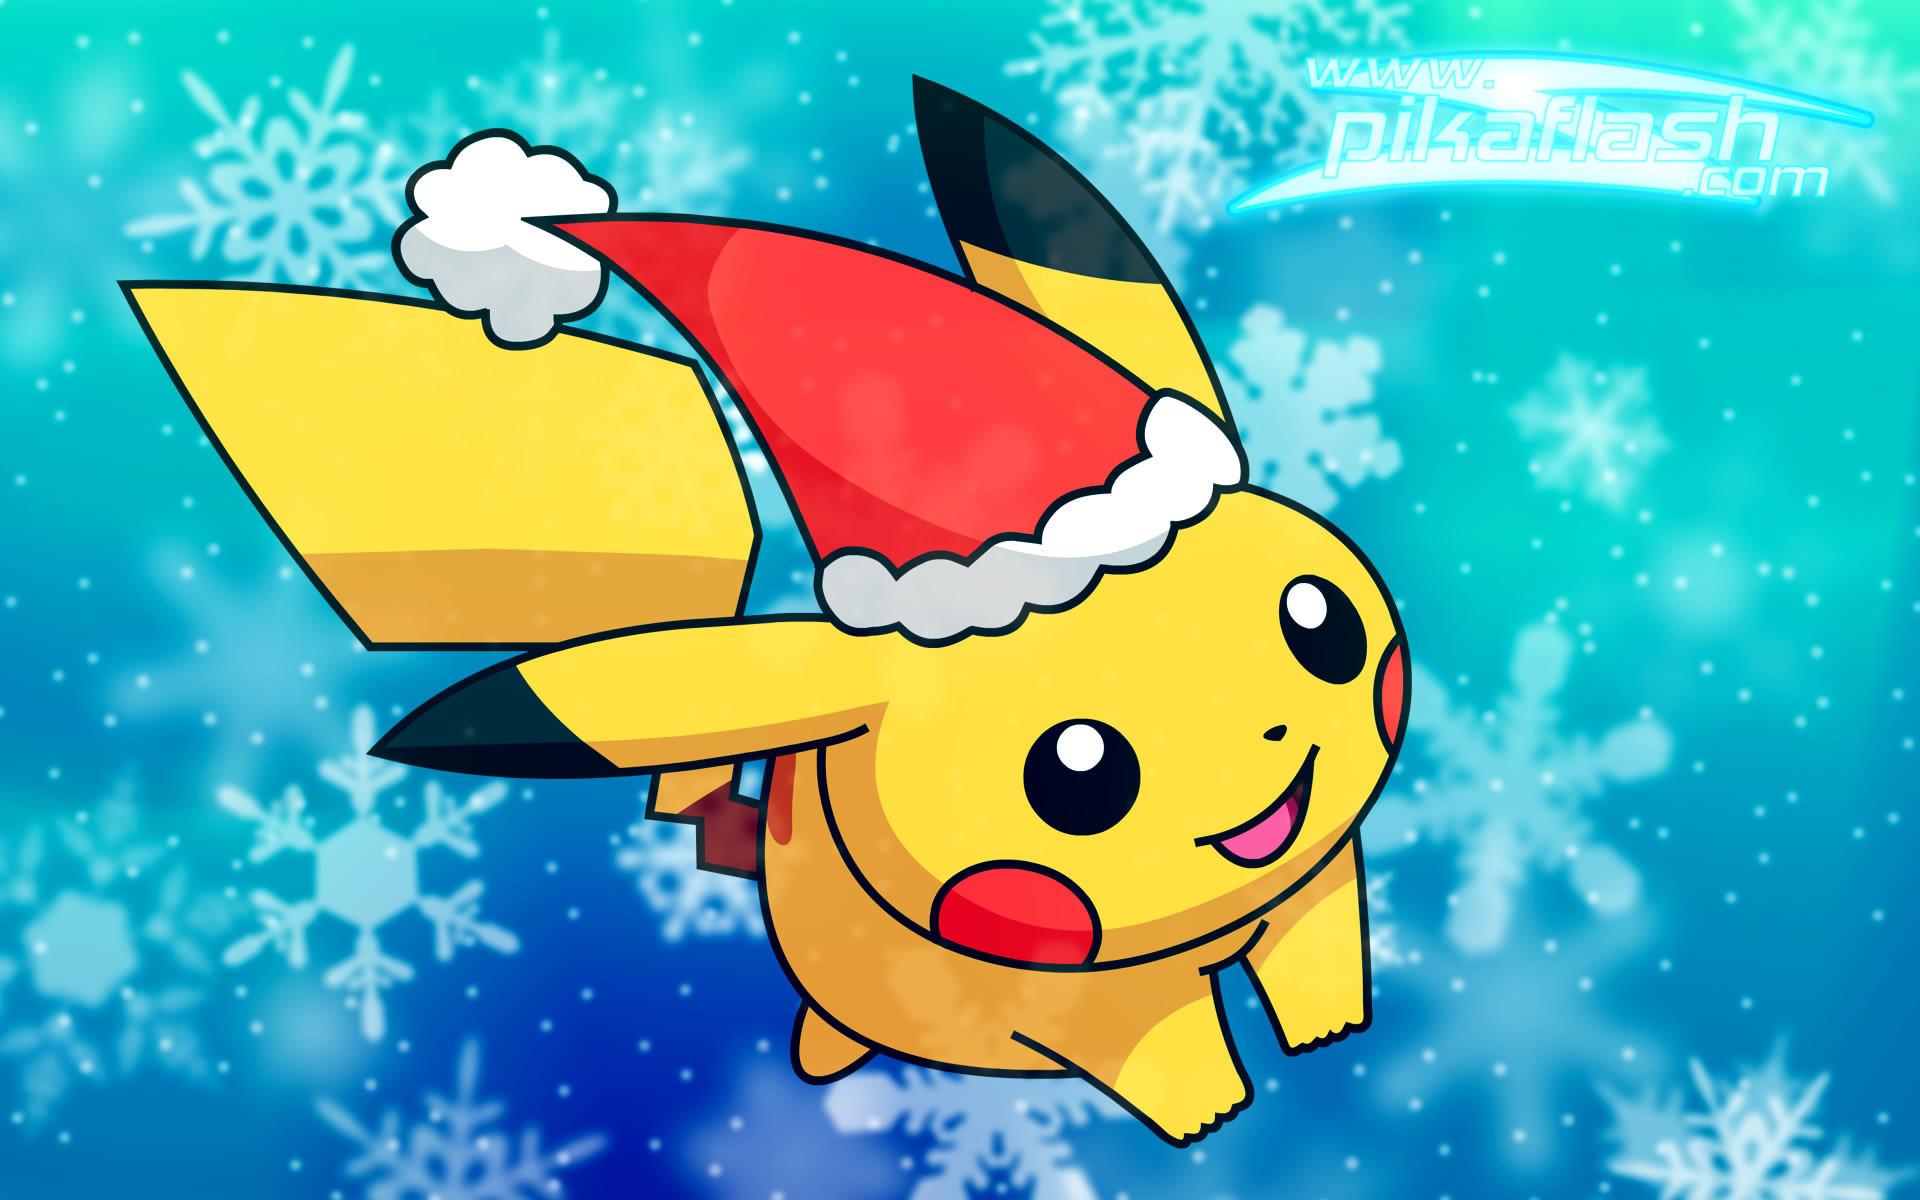 Cute Pokemon Picture As Wallpaper HD